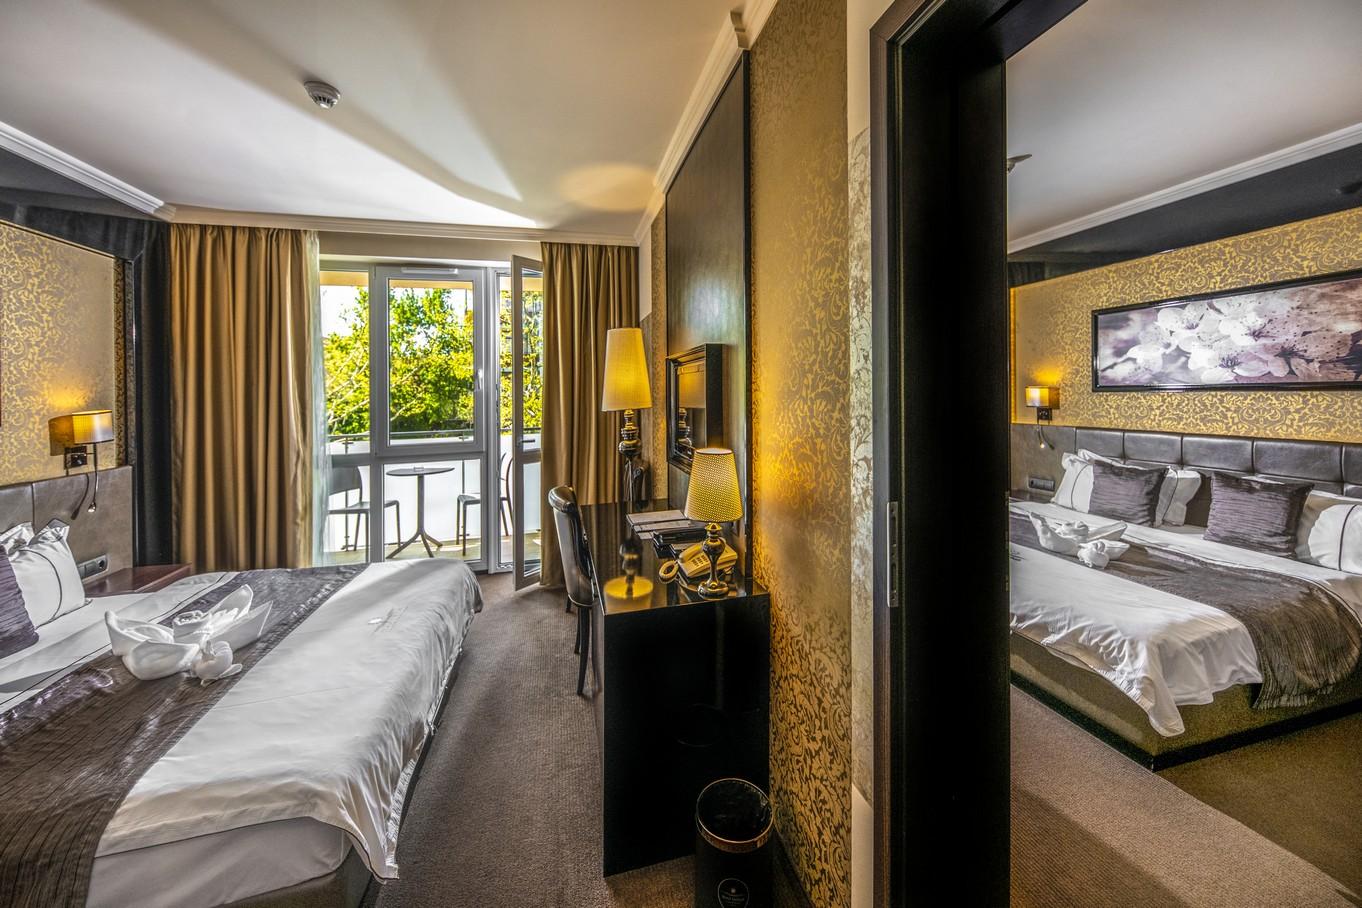 Classic-erkelyes-osszenyitott-csaladi-HotelDelibab